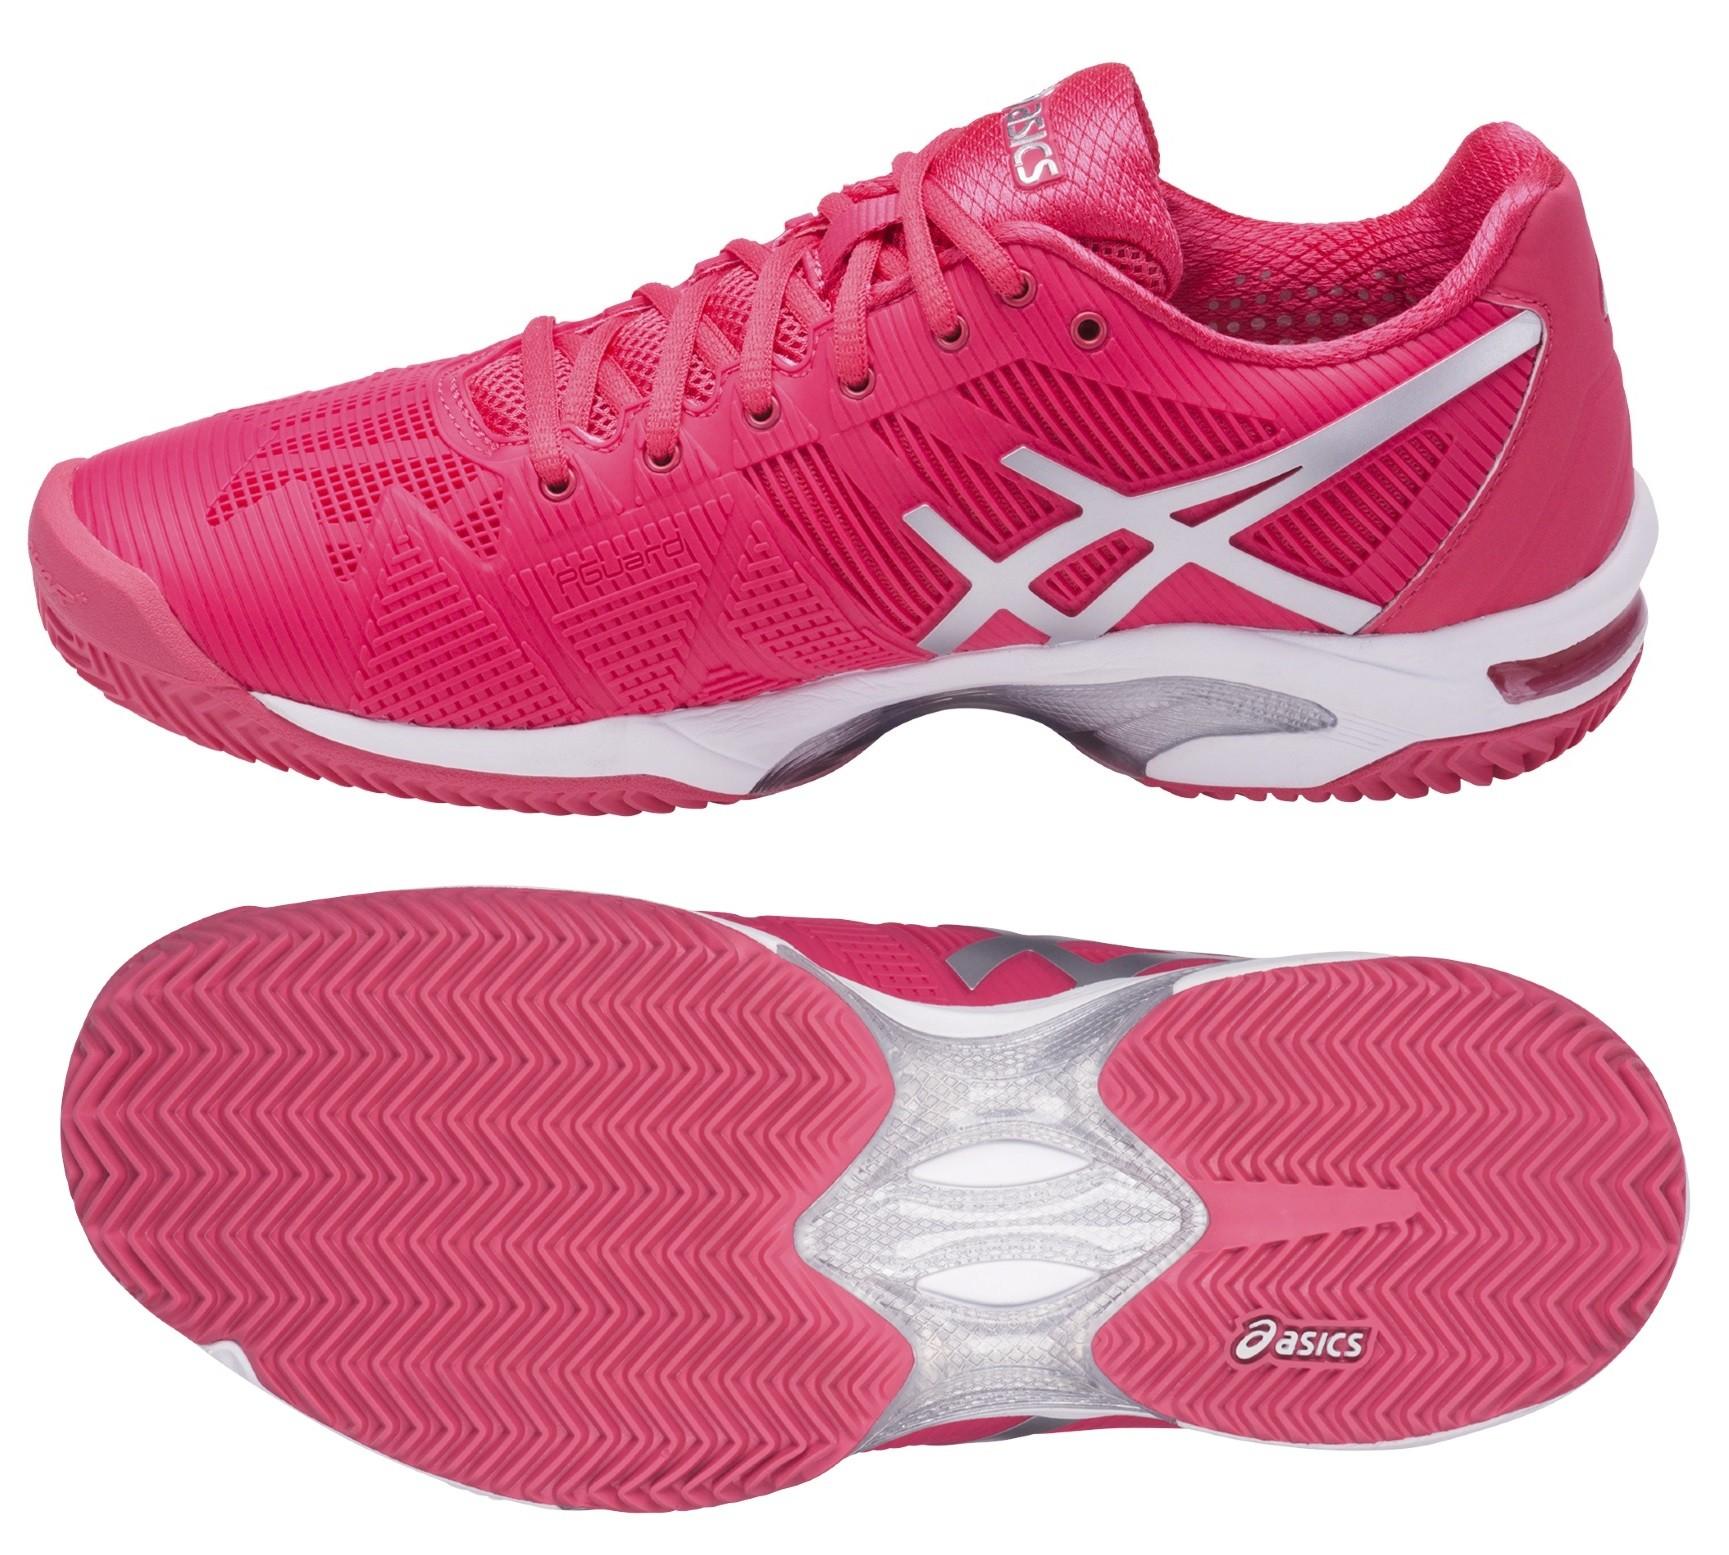 Dámská tenisová obuv Asics Gel Solution Speed 3 Clay E651N-1993 růžová 901d7fdf8c